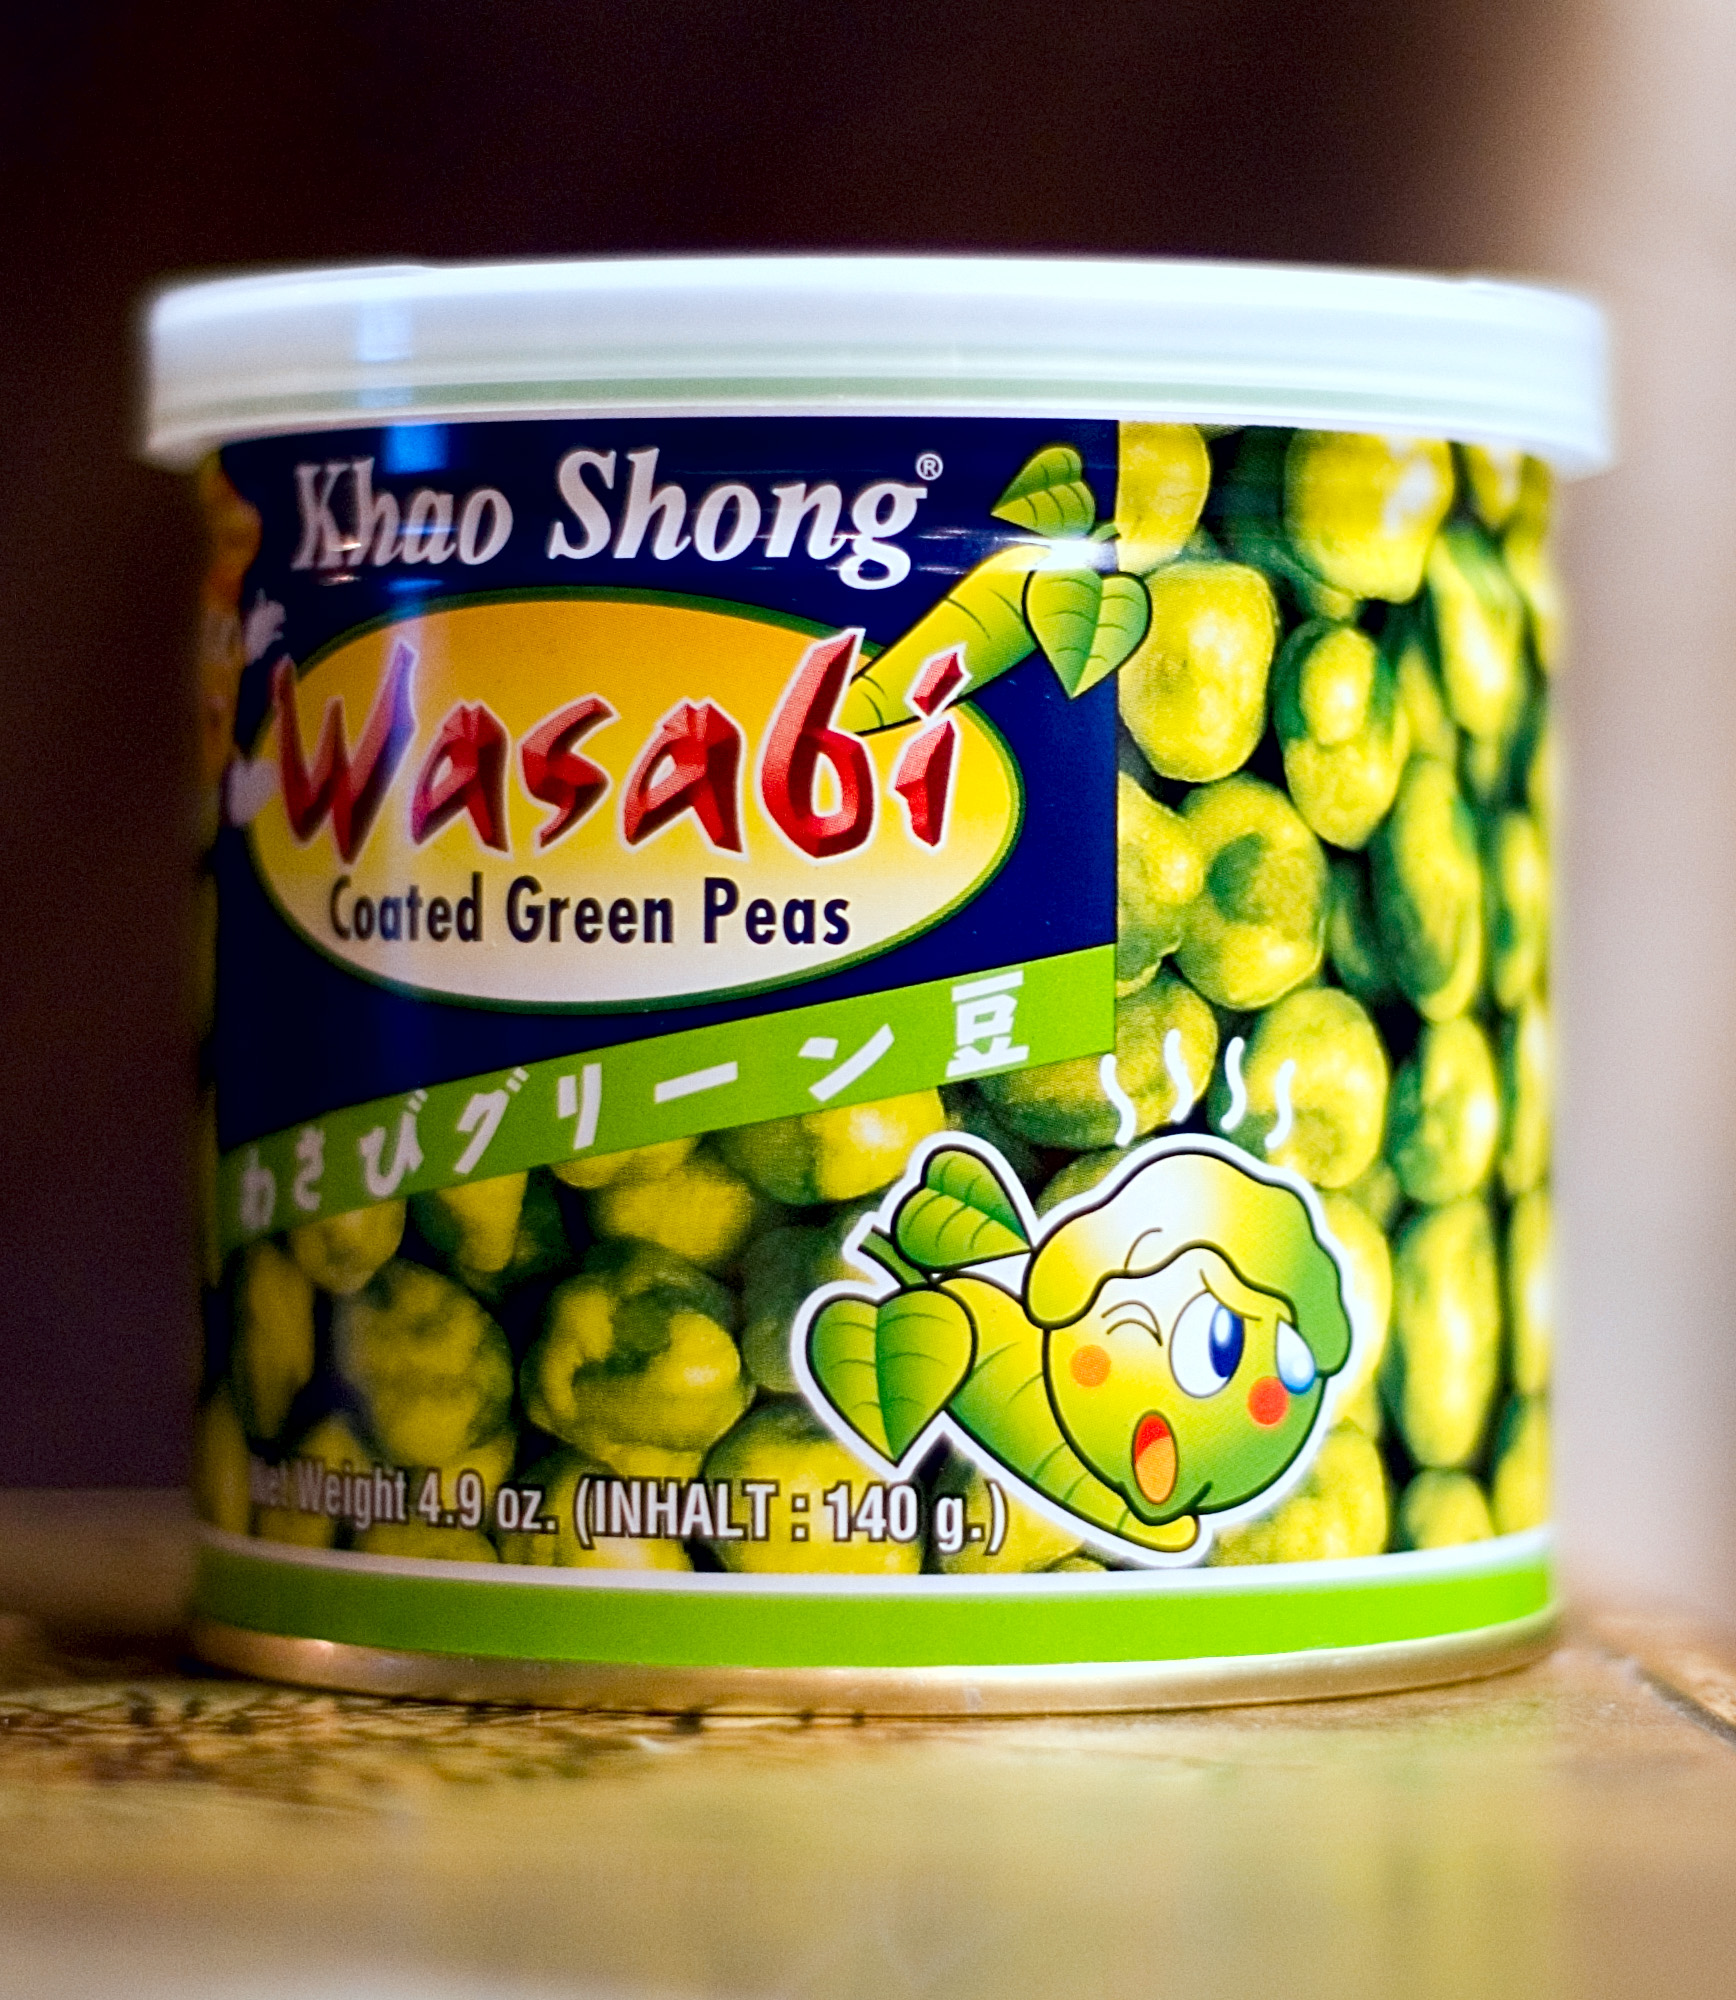 FileWasabi coated green peasjpg  Wikimedia Commons # Wasbak English_182340